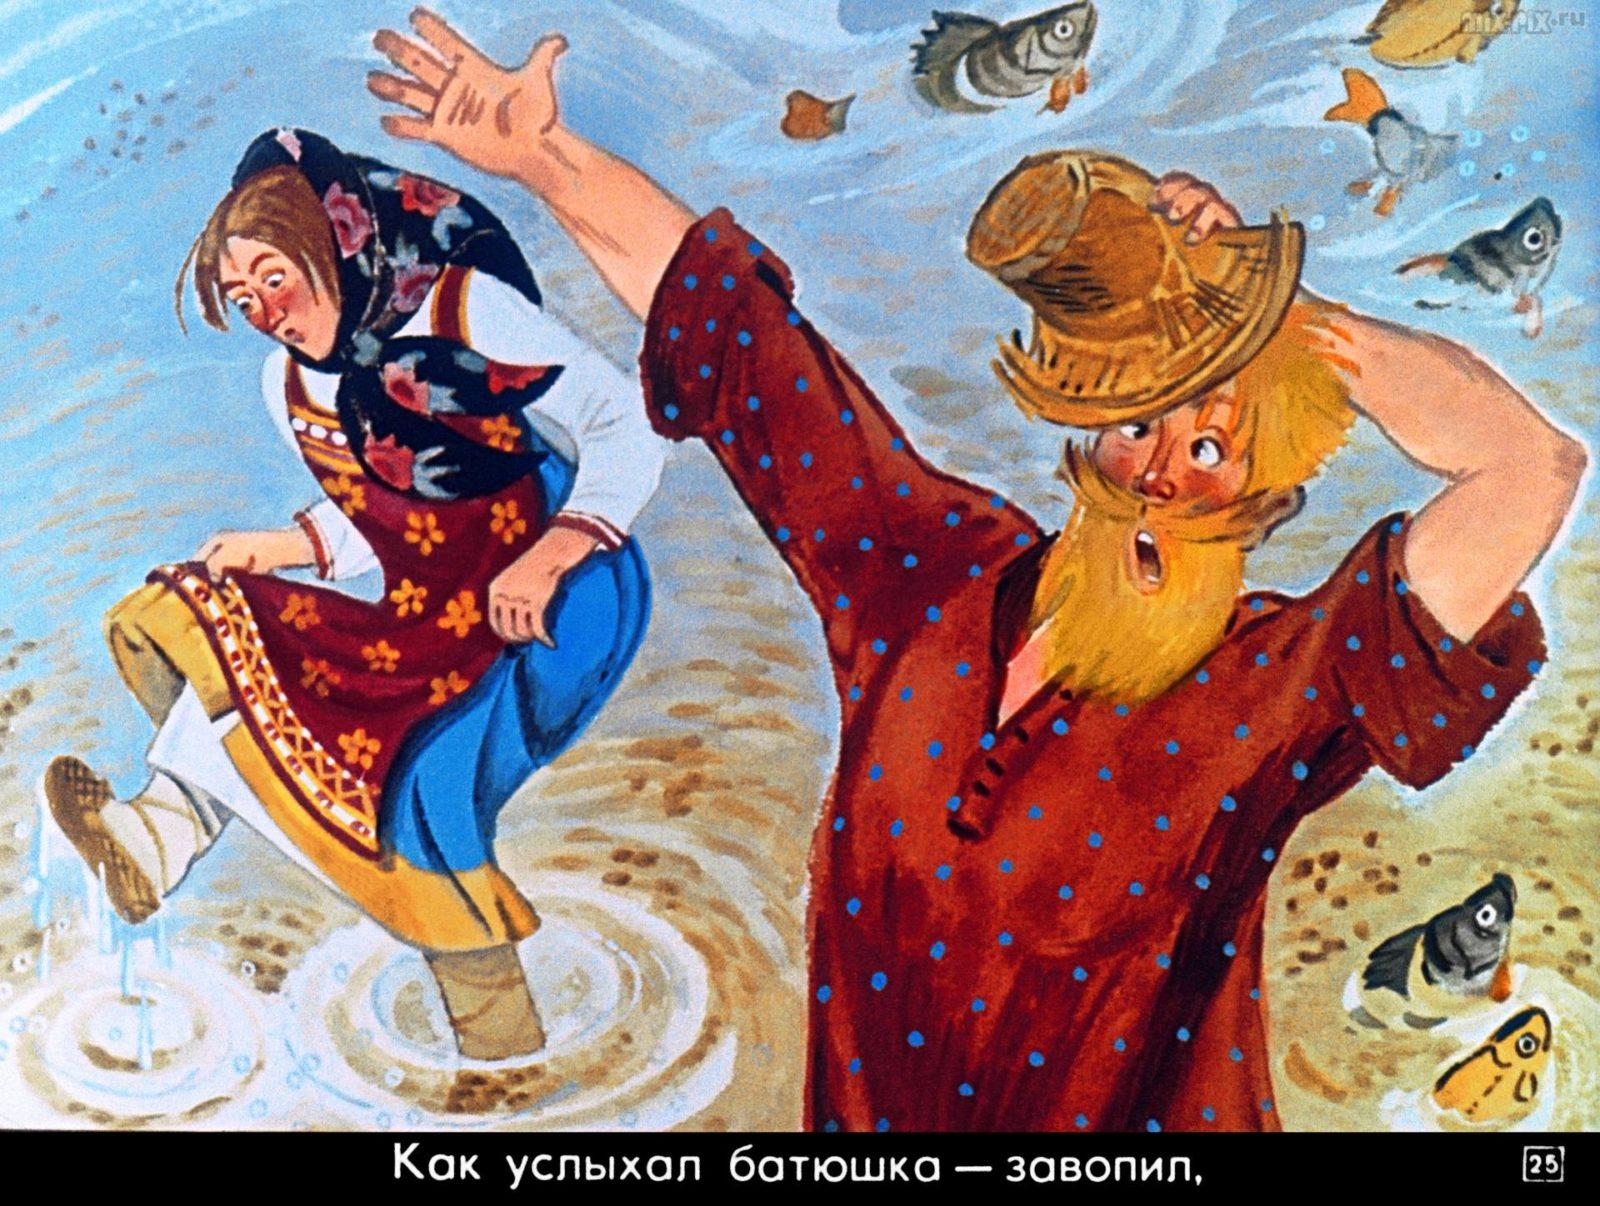 Курочка Ряба (1981) 44